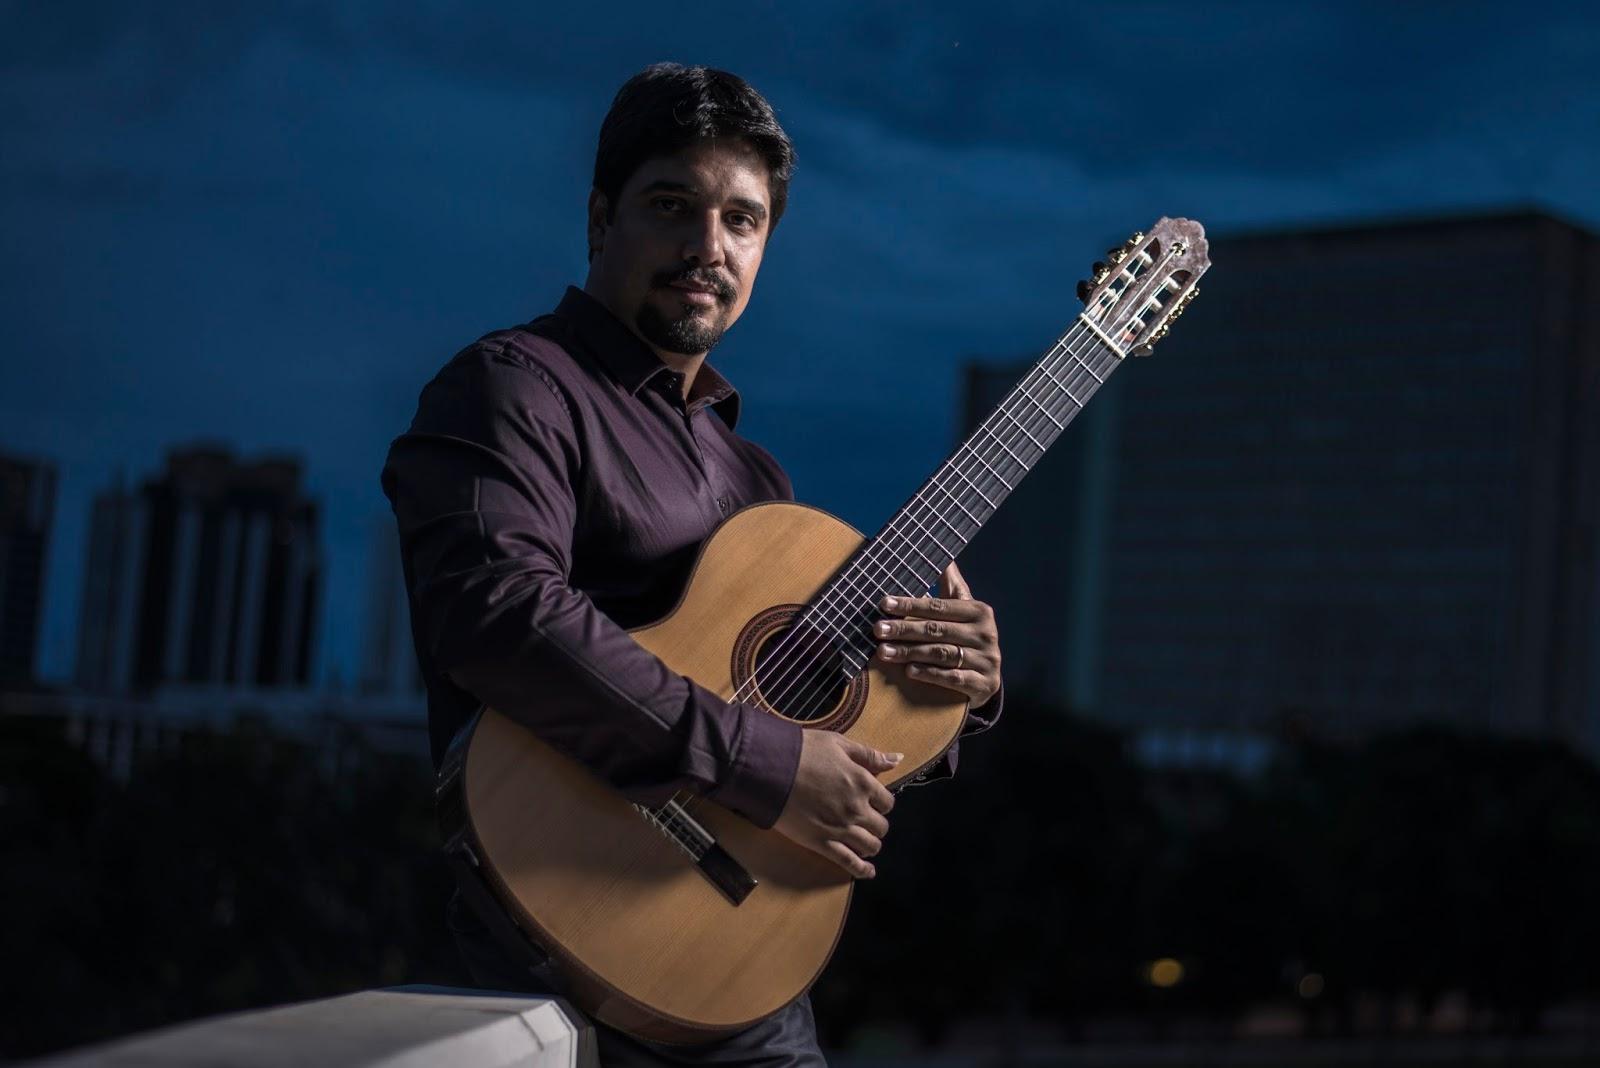 Fabiano Borges